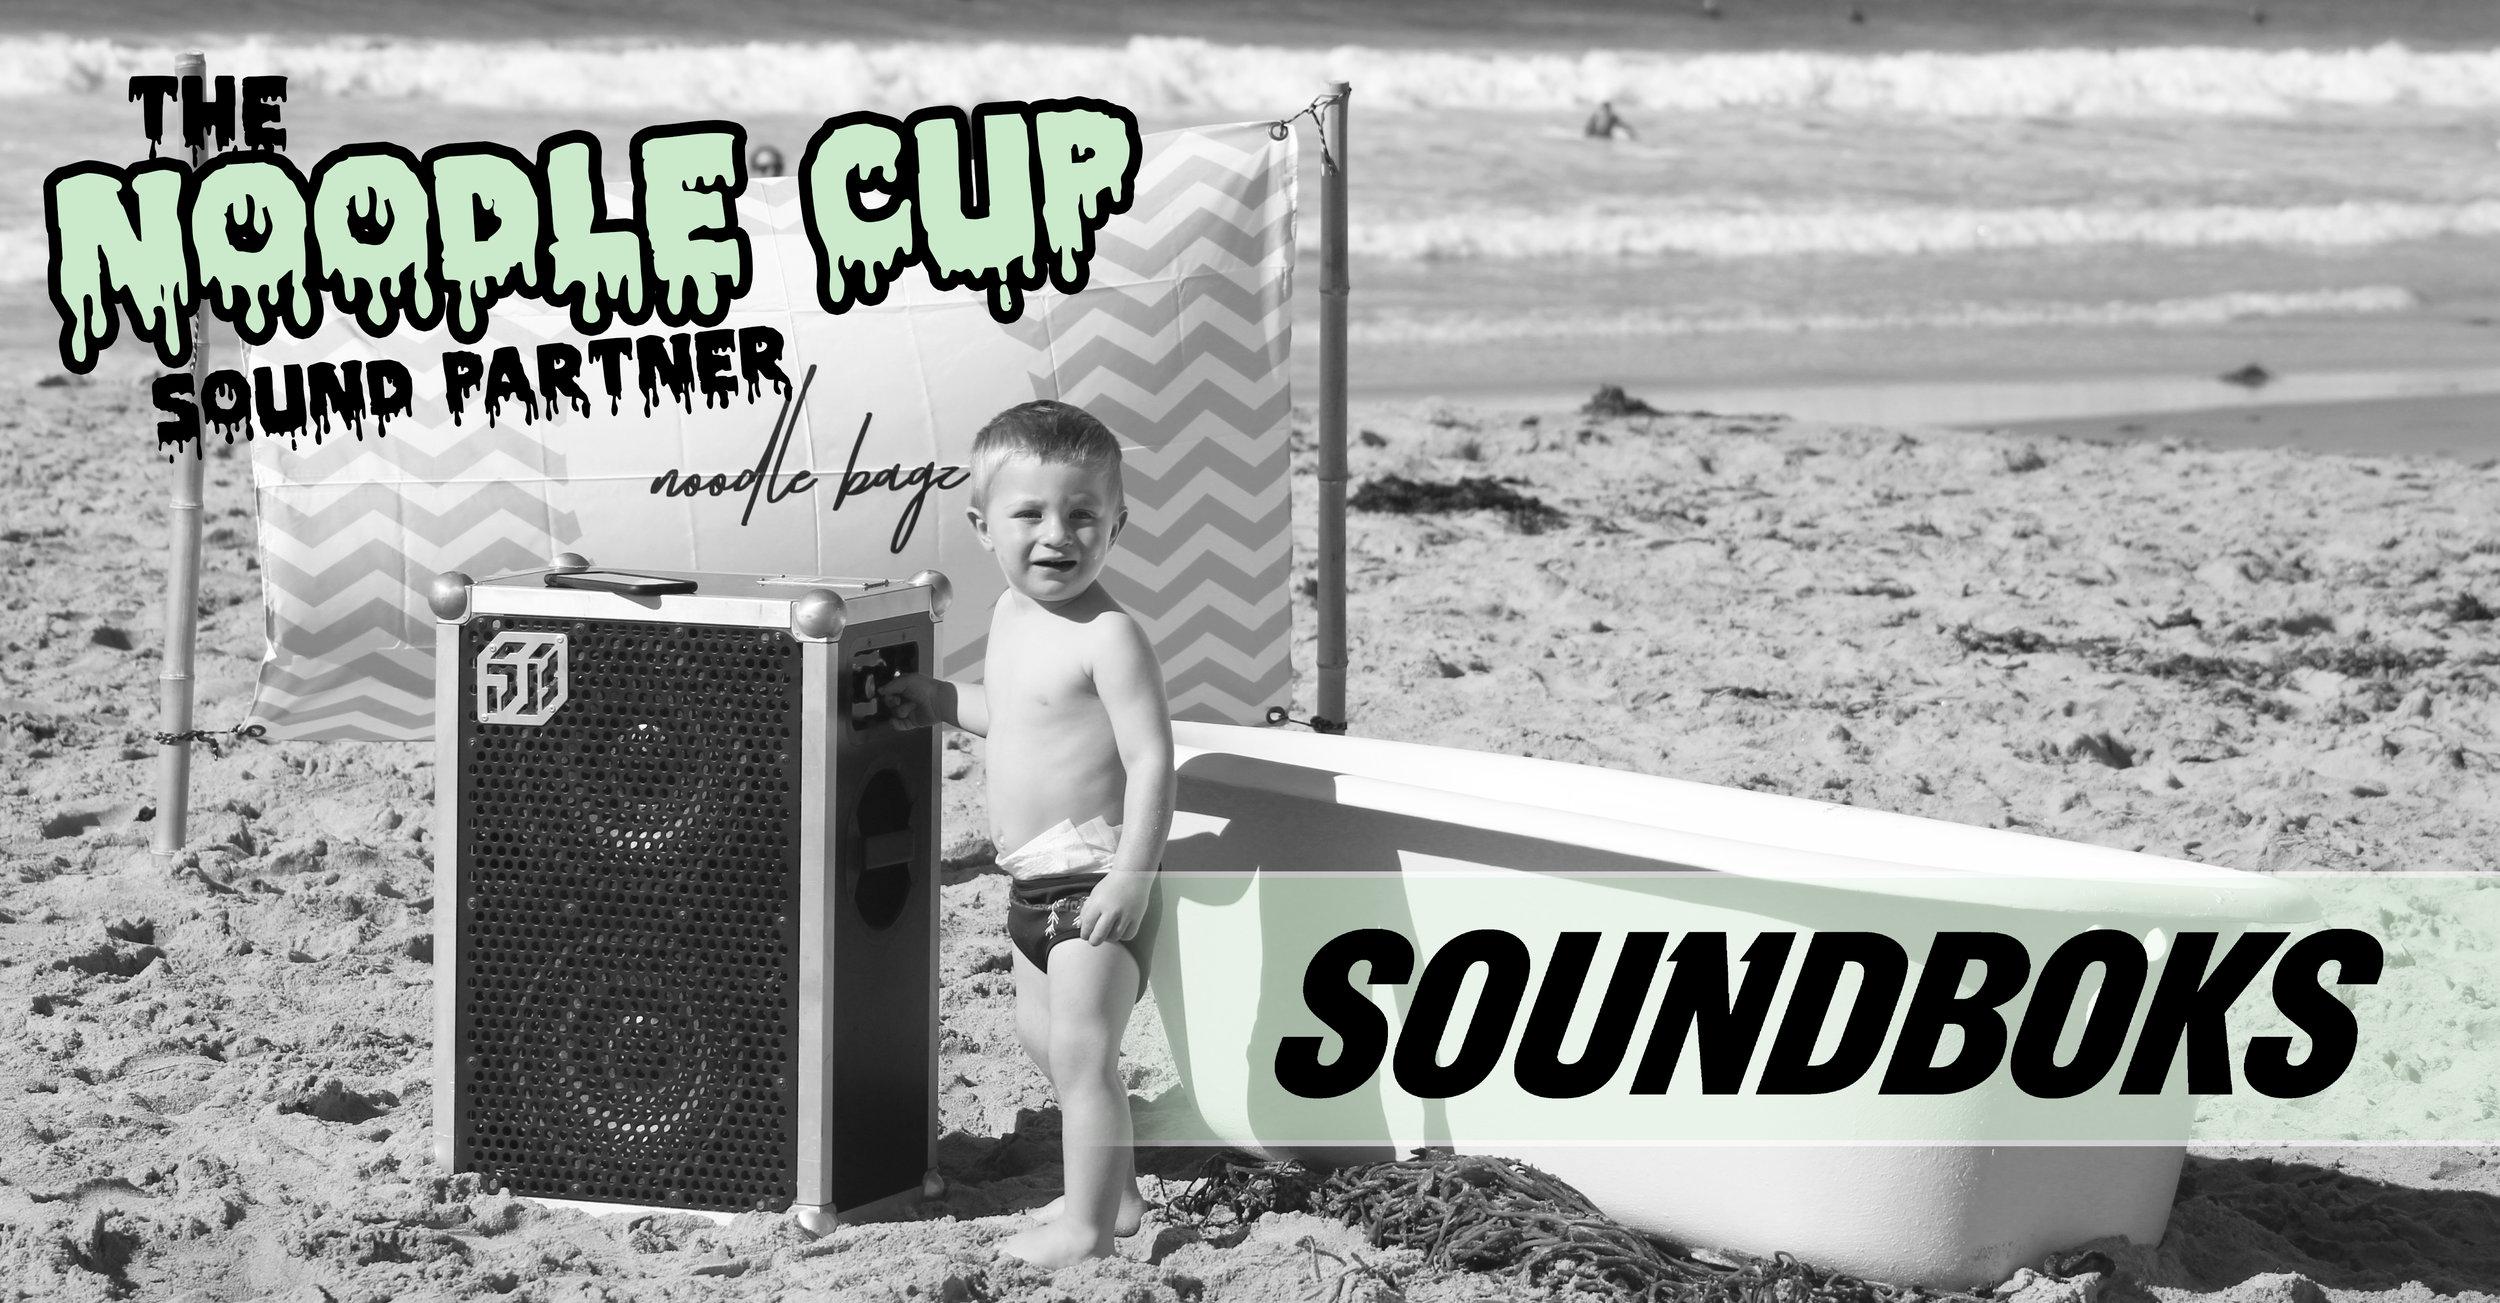 soundboksnoodlecup.jpg